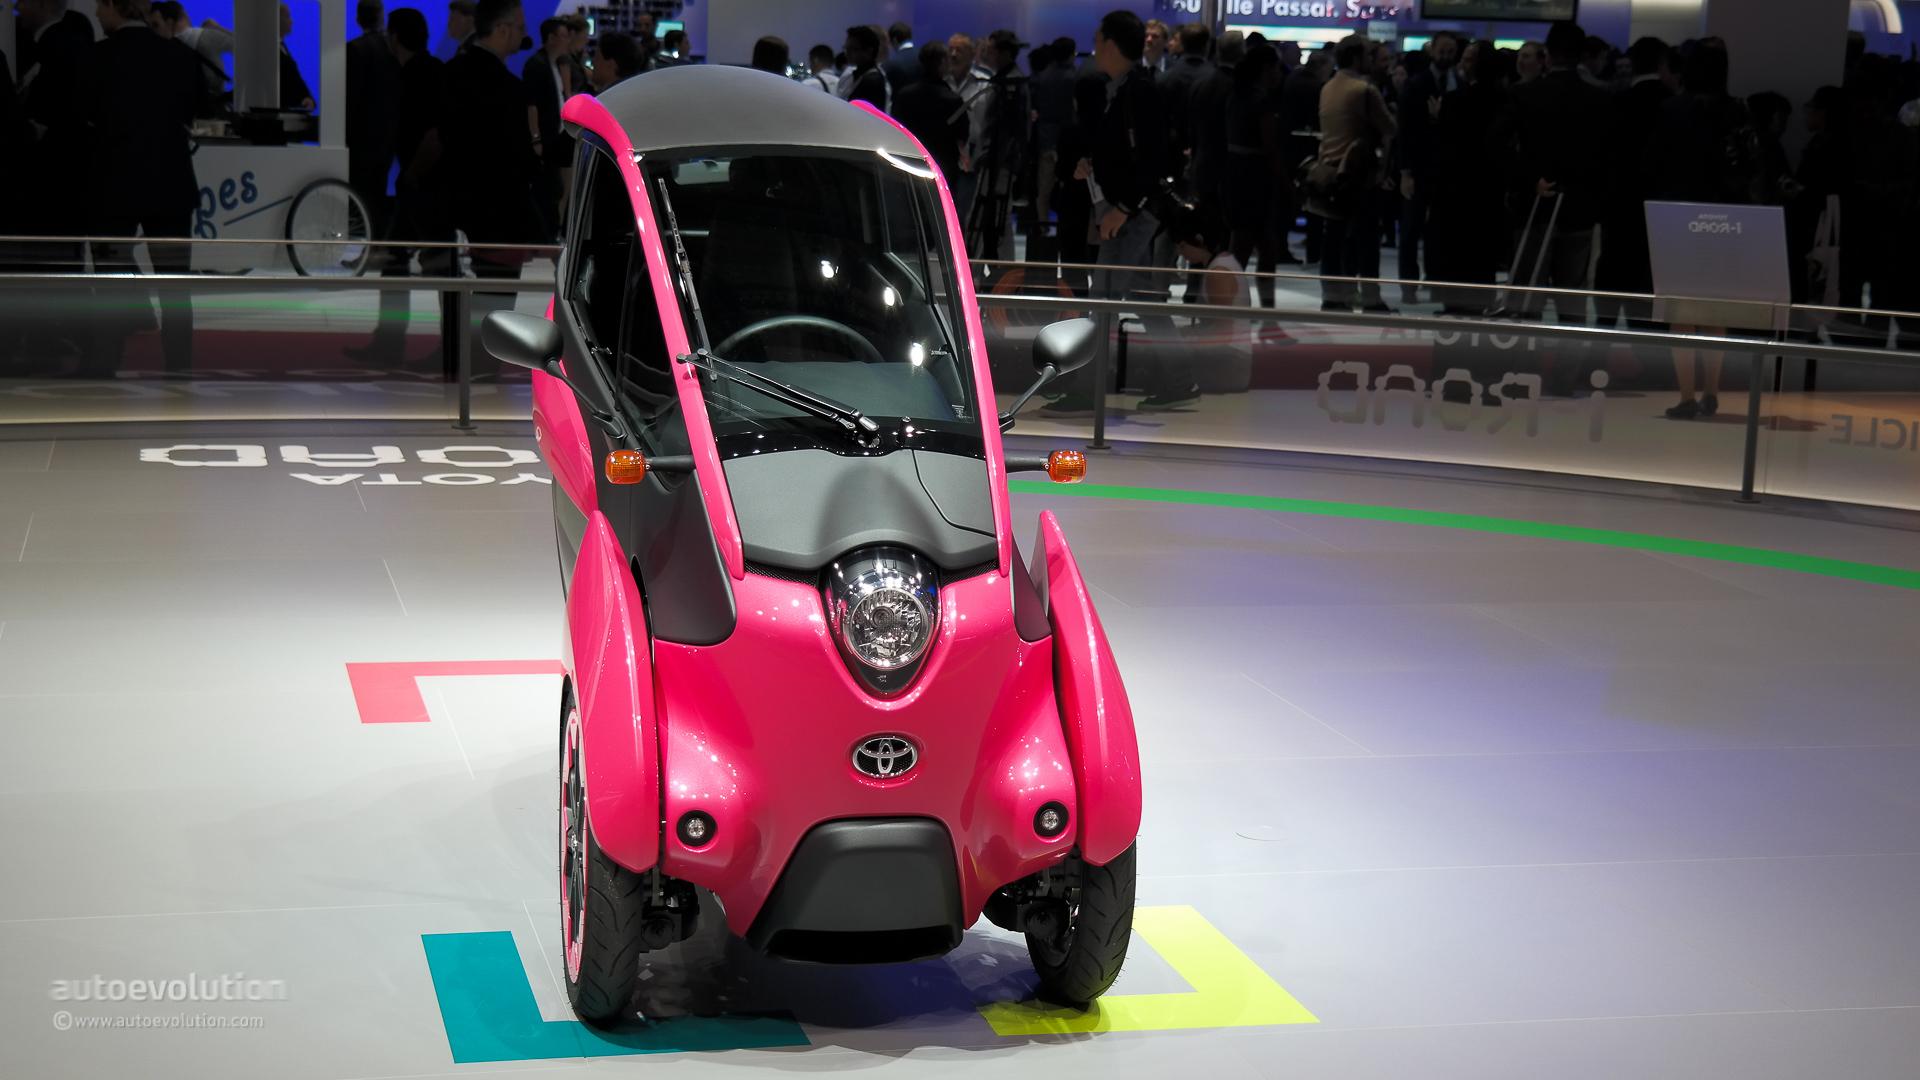 2014 Toyota Tacoma >> Toyota i-Road Wears Pink at Paris Motor Show 2014 [Live Photos] - autoevolution